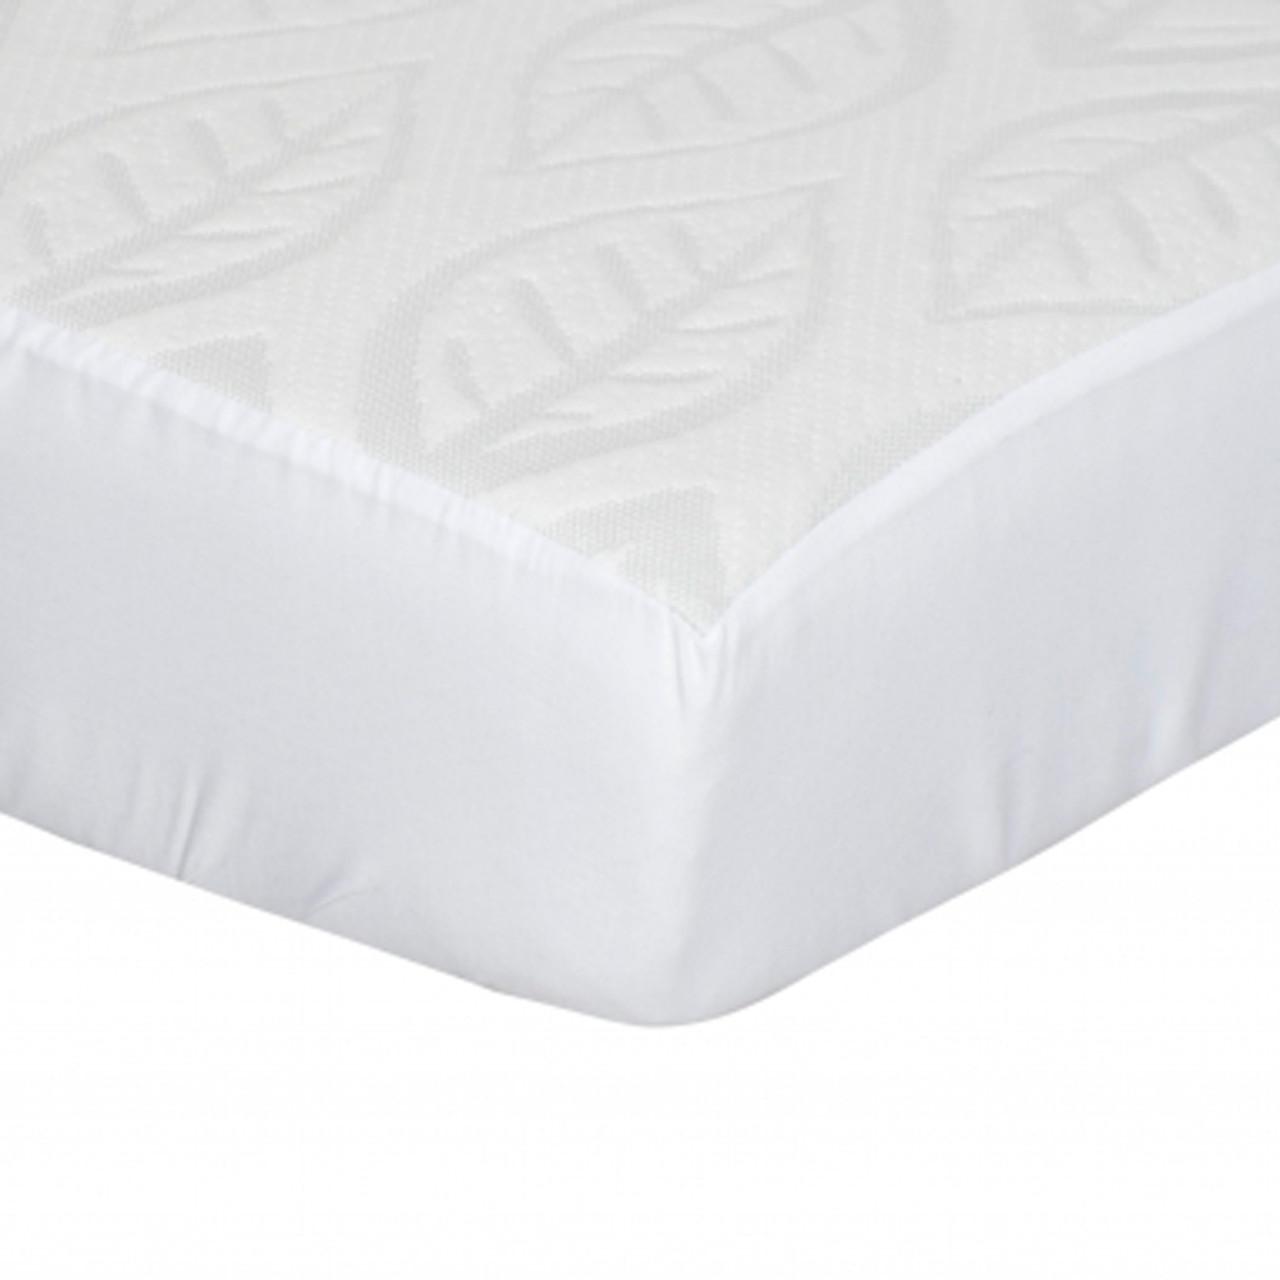 Kidicomfort Tencel Fitted Crib Mattress Cover Leaf Design Dear